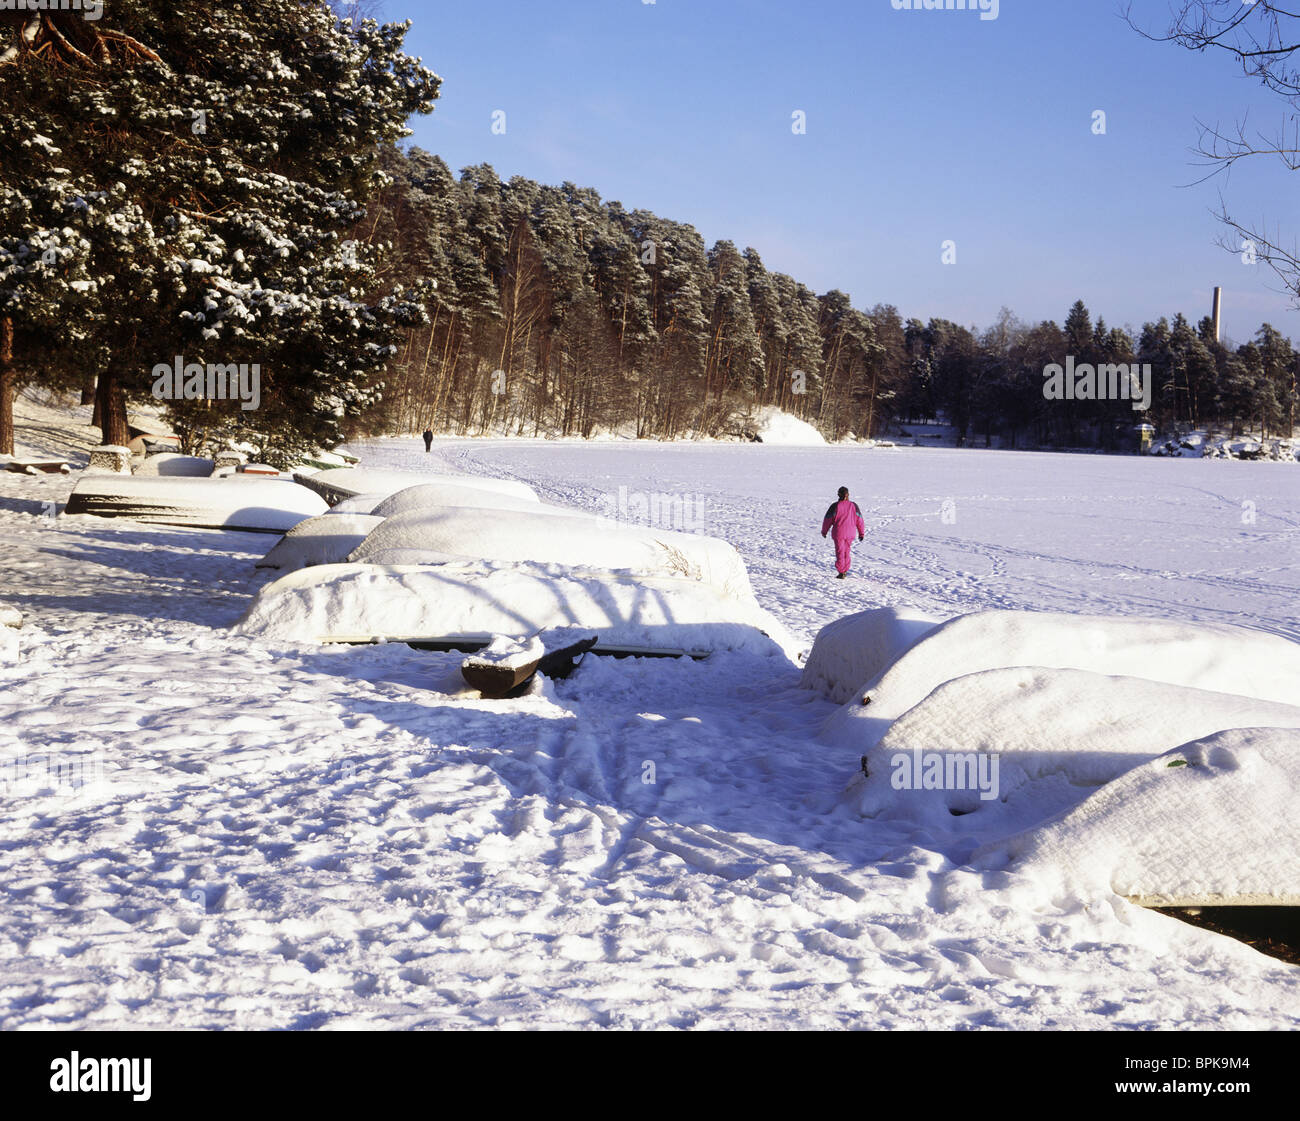 Lake Pyhajarvi, Tampere, Finland - Stock Image